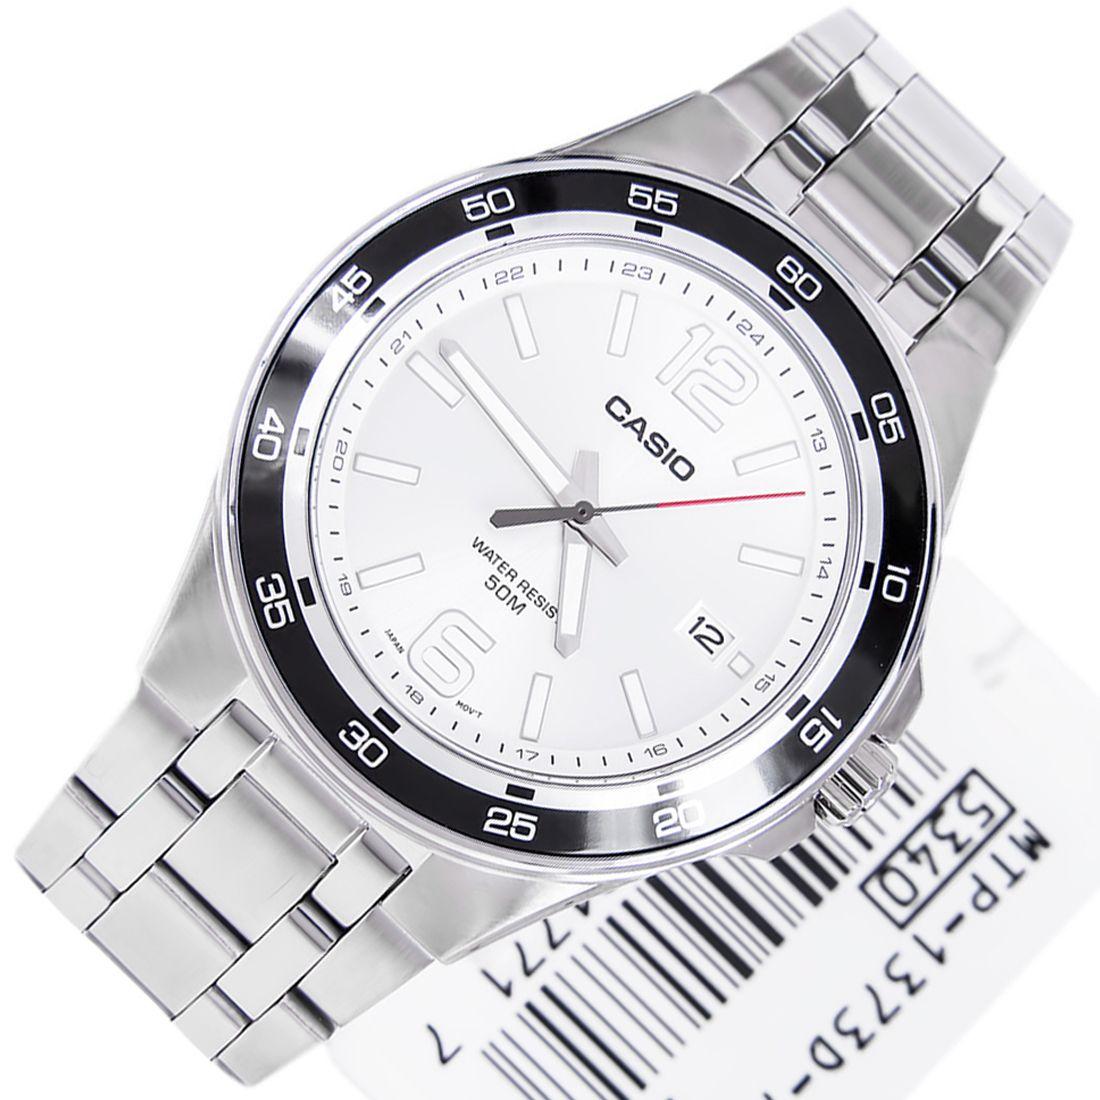 Casio Men Watch Mtp 1373d 7avdf Casio Watches For Men Casio Quartz